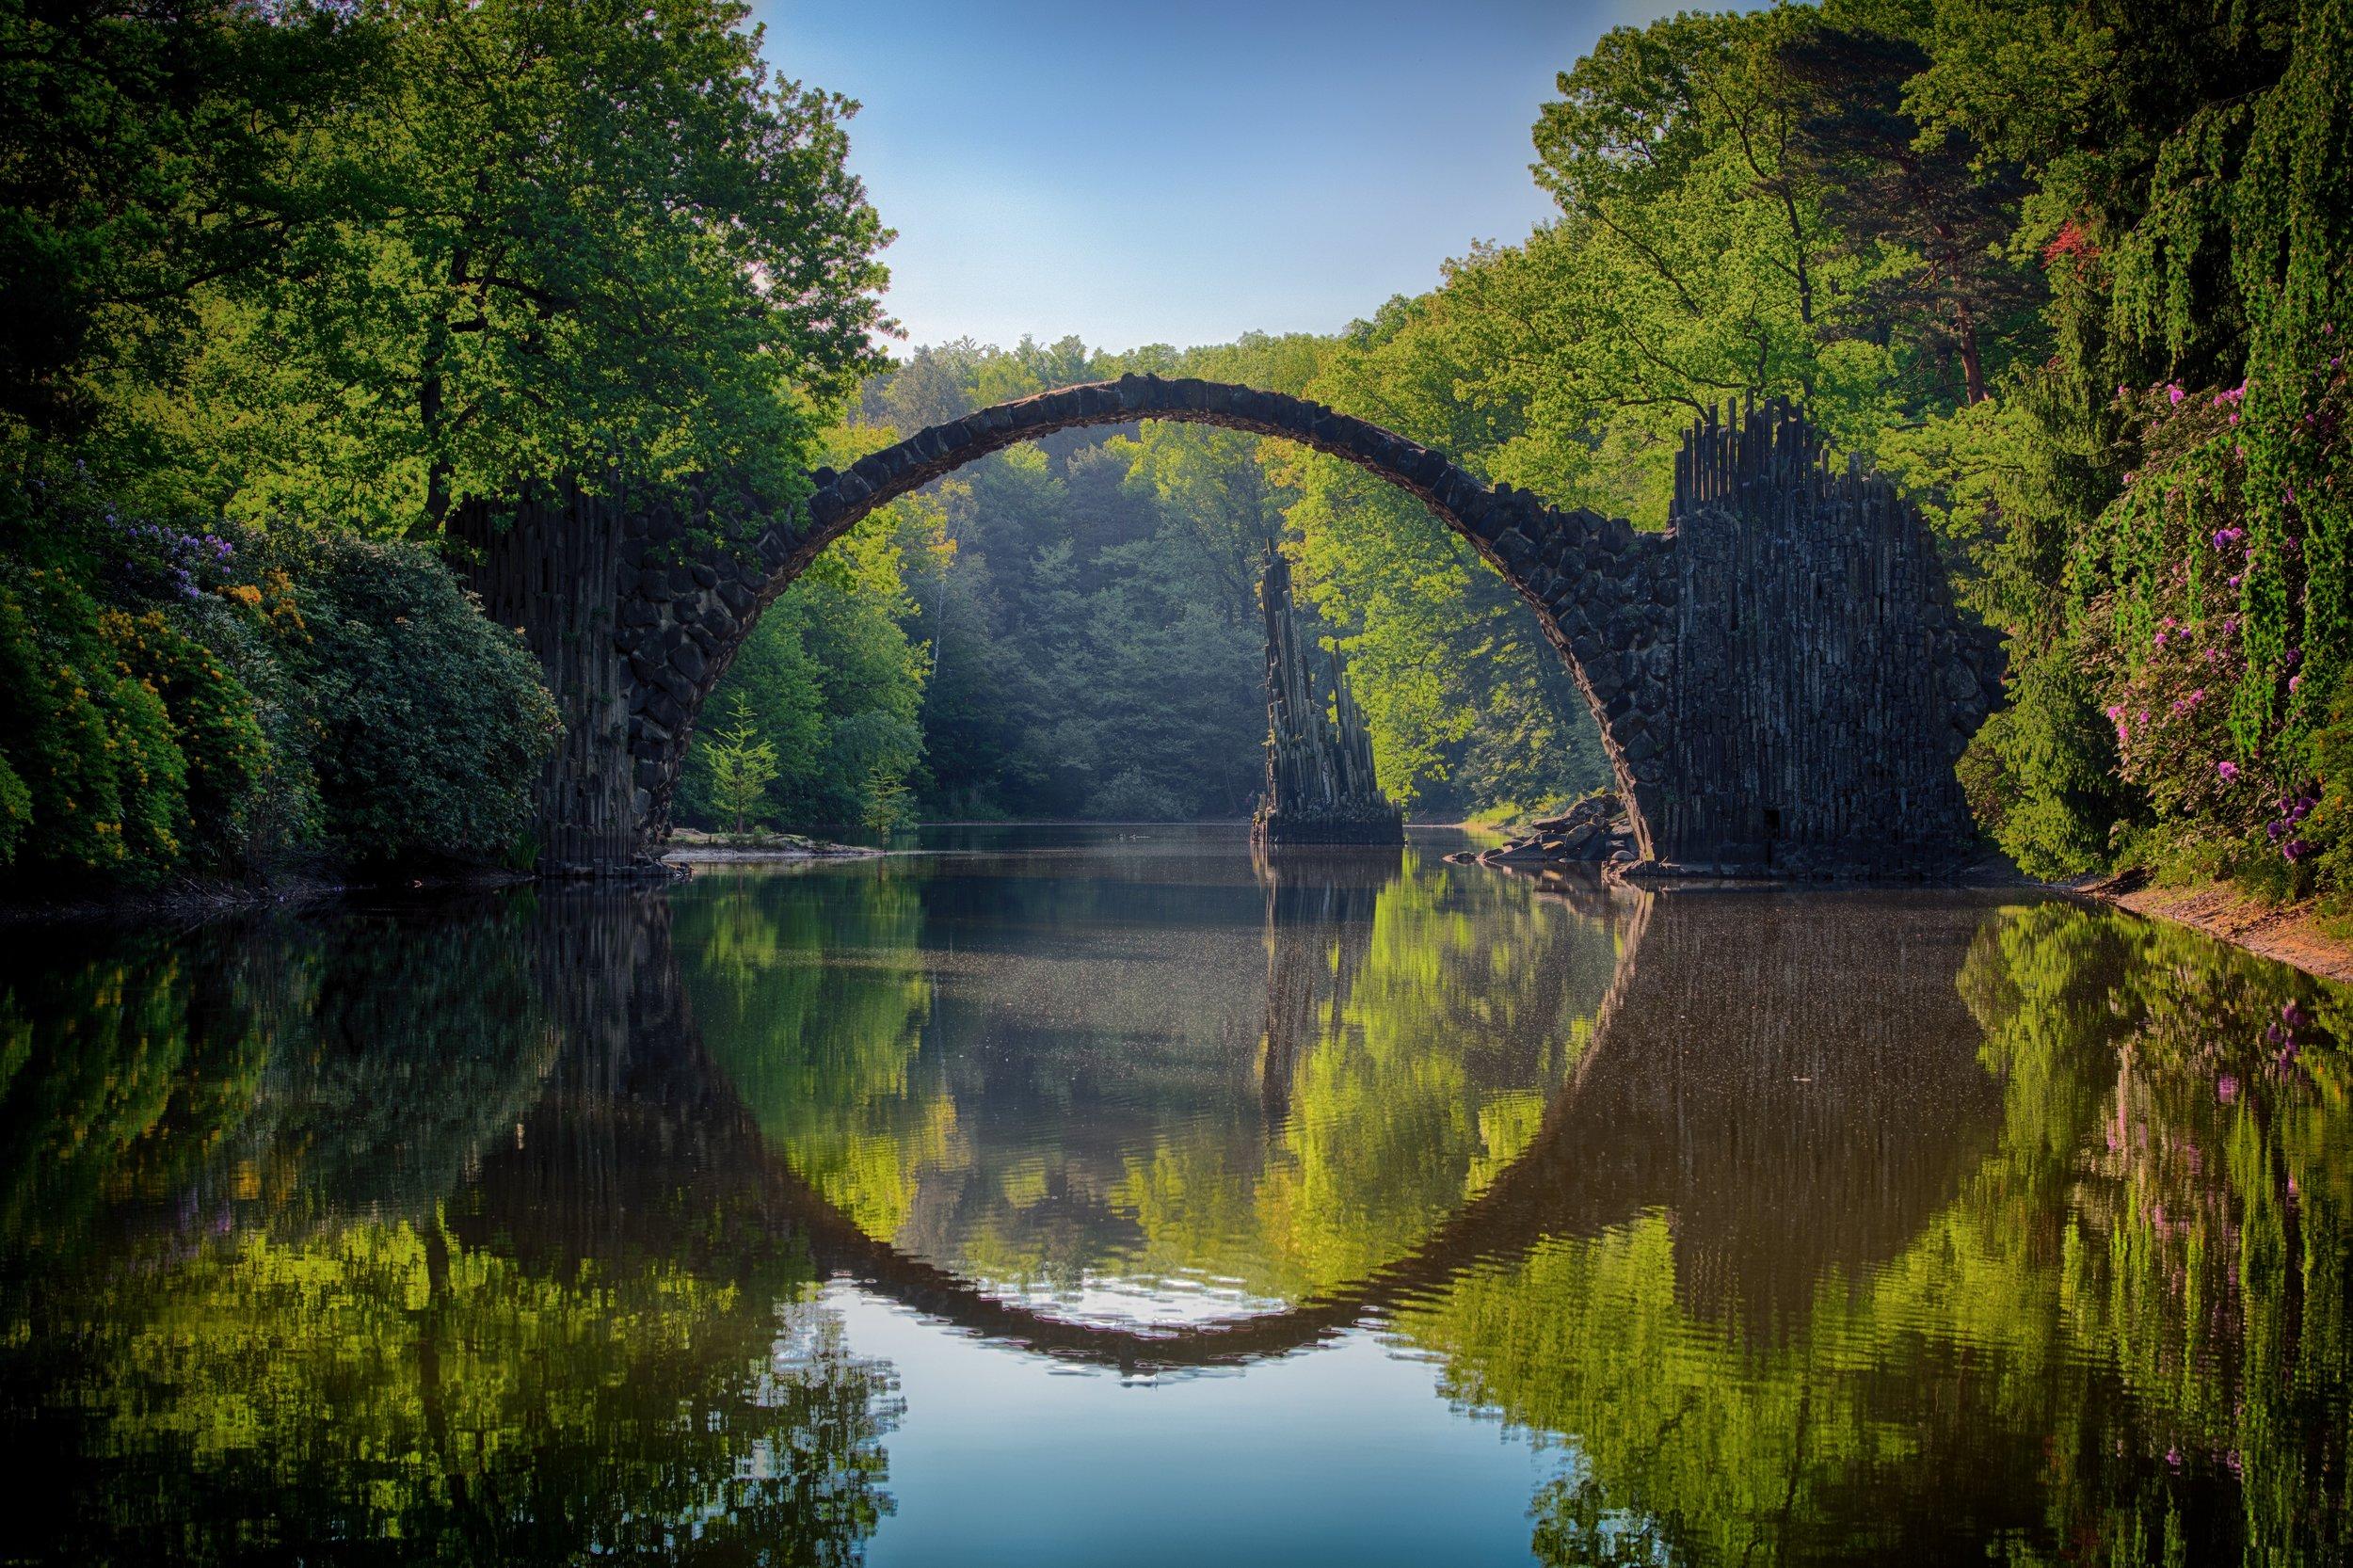 arch-bridge-clouds-814499.jpg